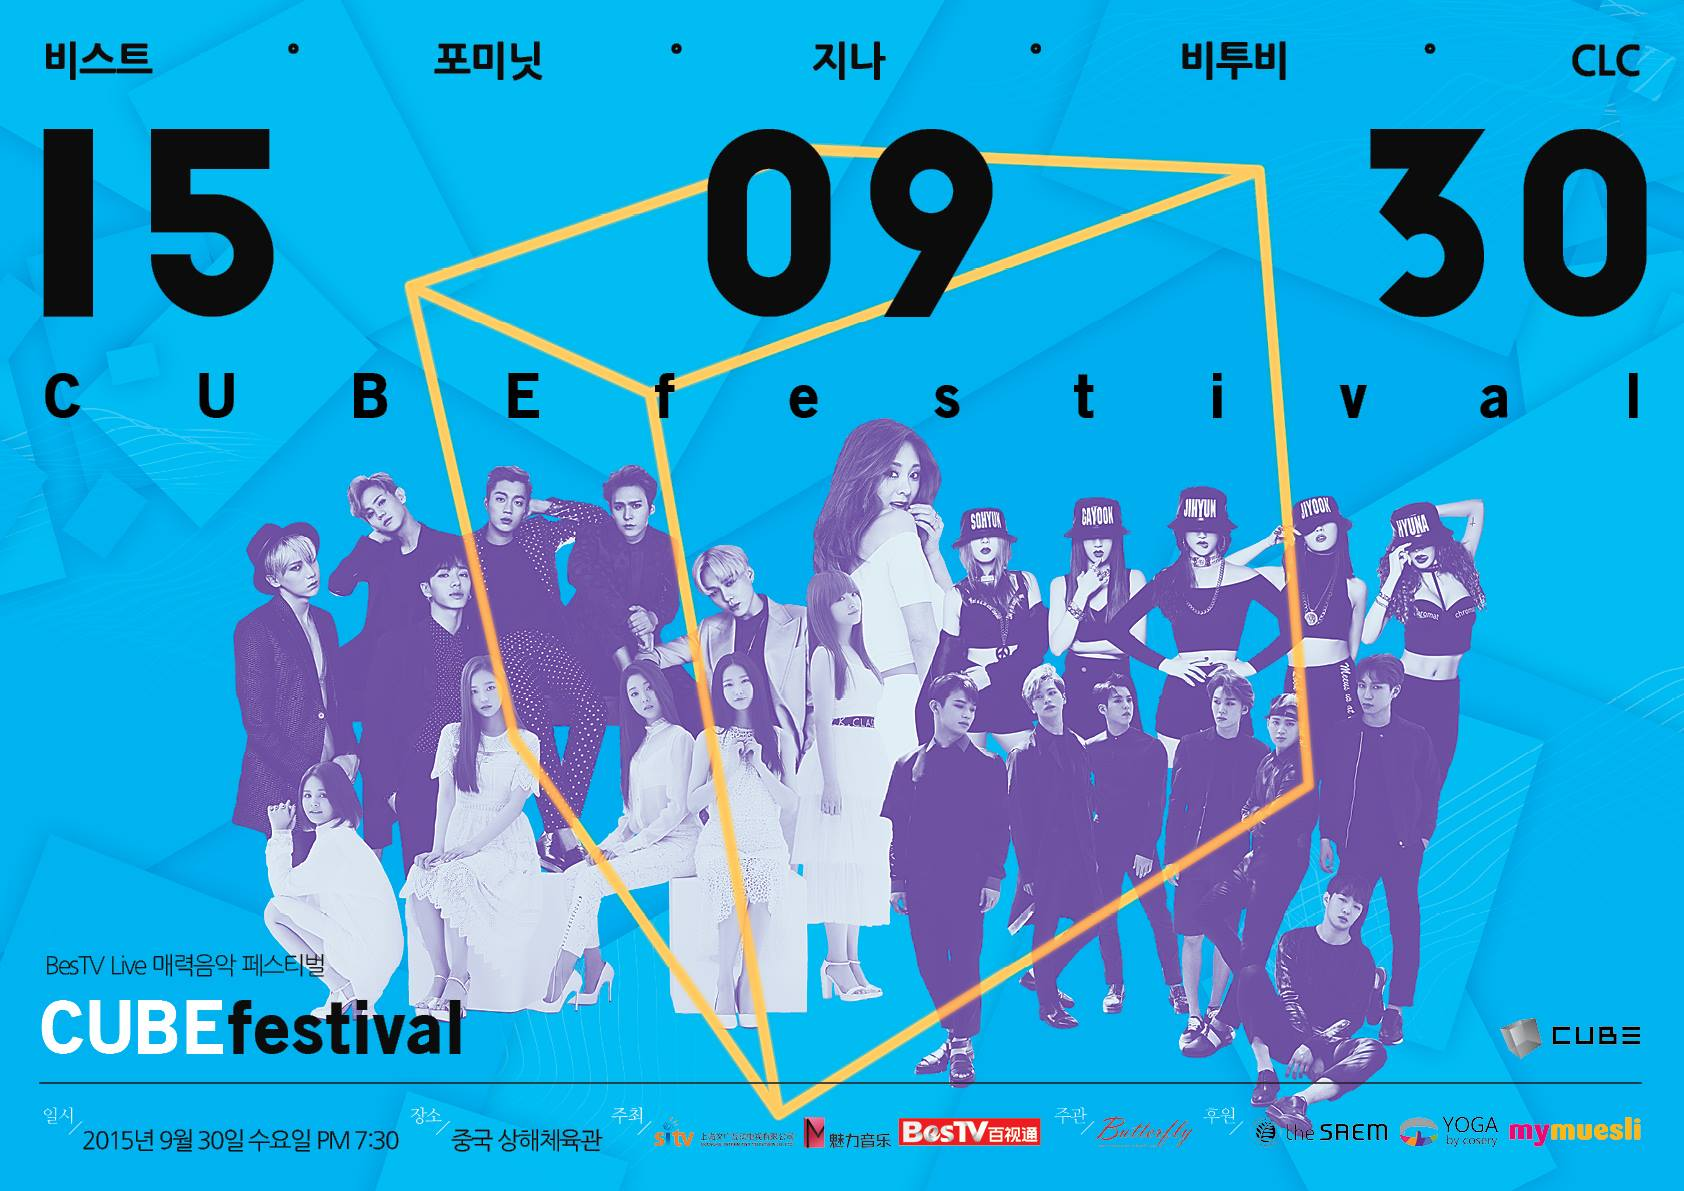 Cube娛樂:好像這間公司沒有職員似的...